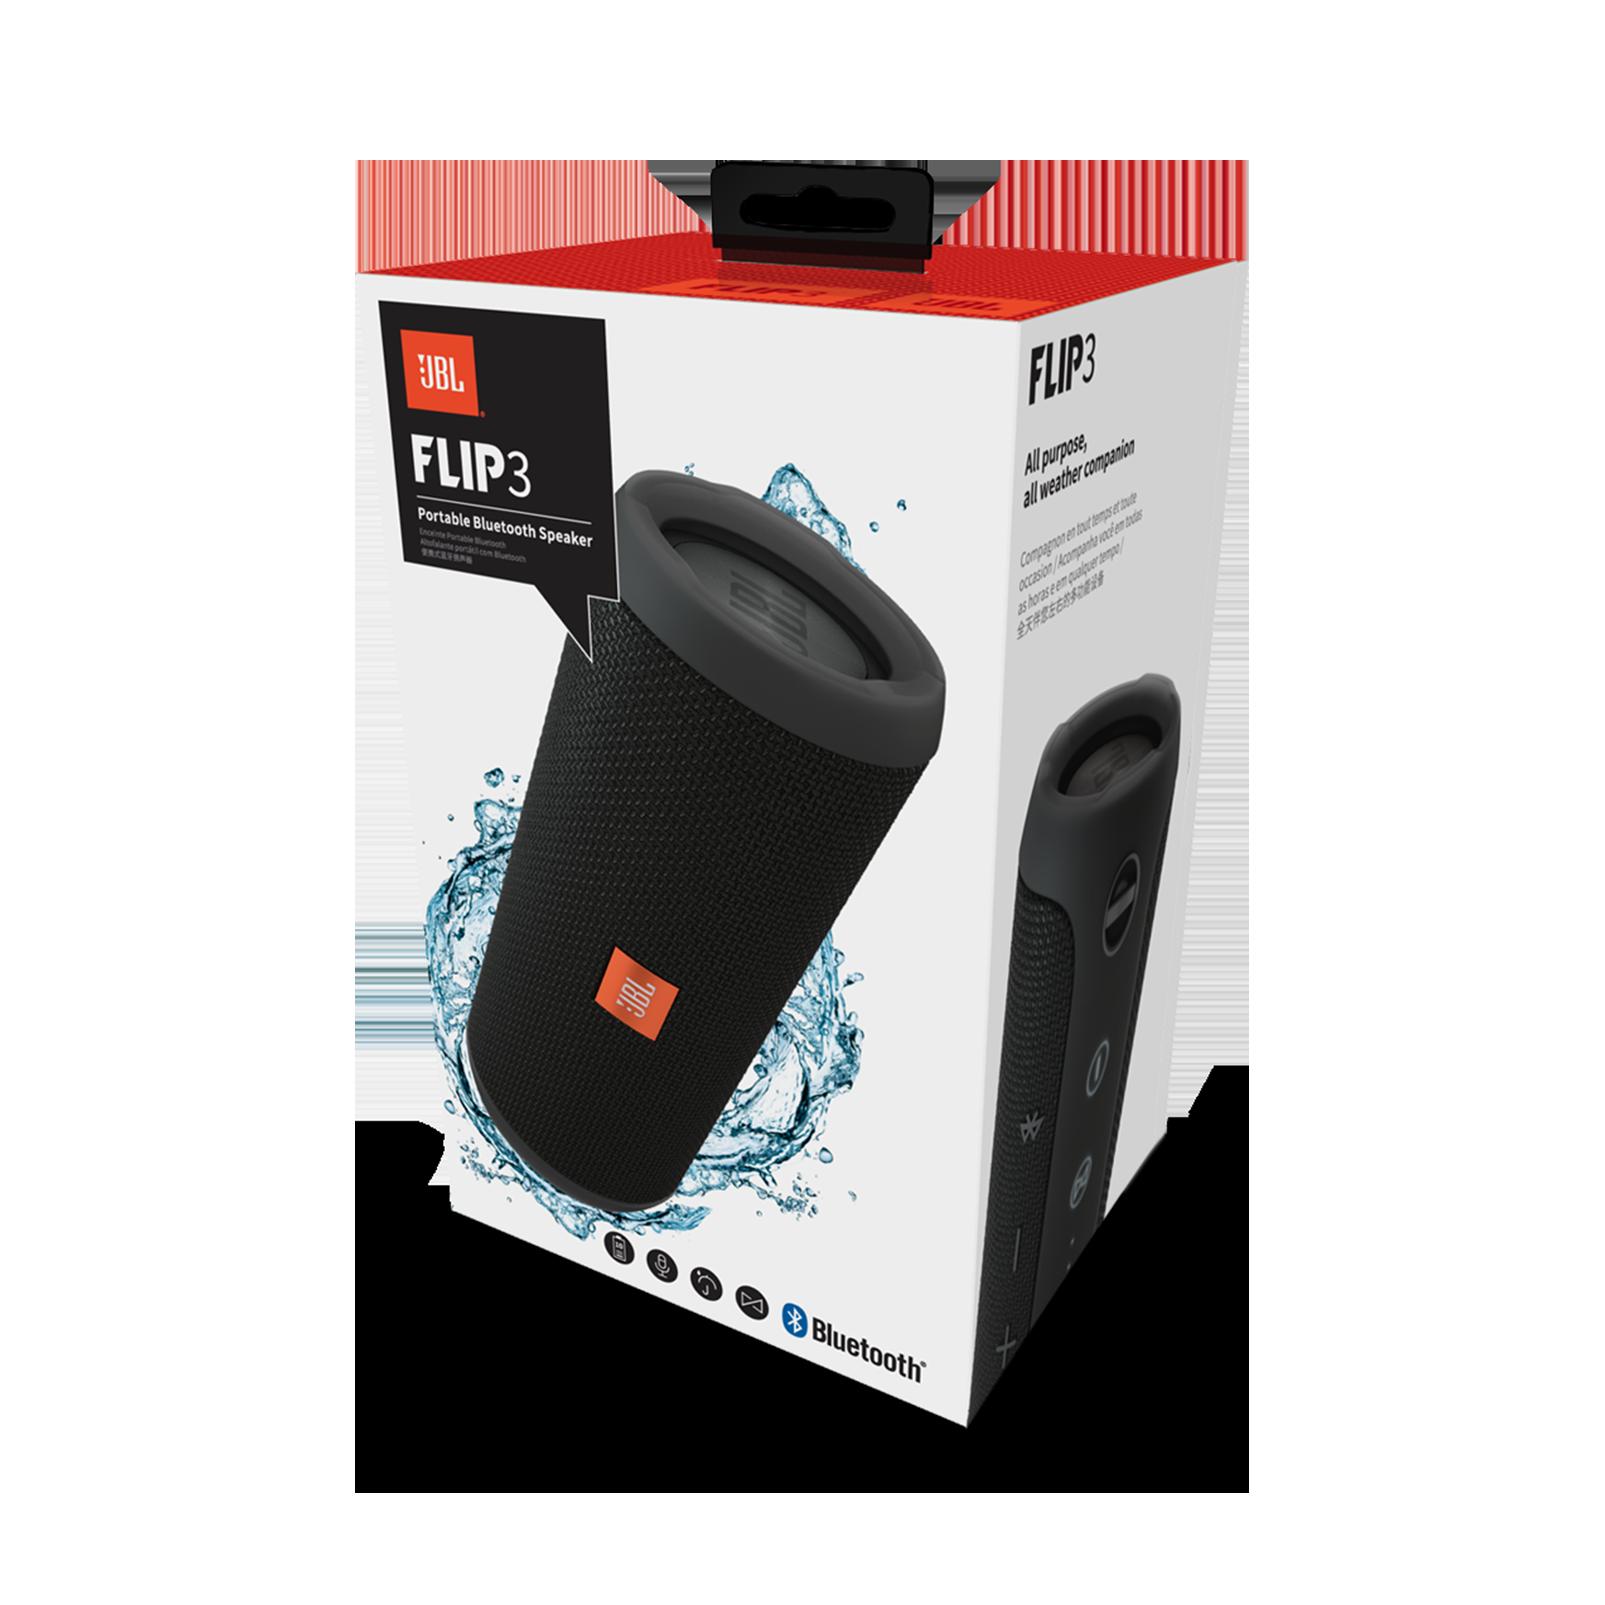 Jbl Flip 3 Full Featured Splashproof Portable Speaker With Xbox Guitar Controller Usb Wire Diagram Manuals Downloads